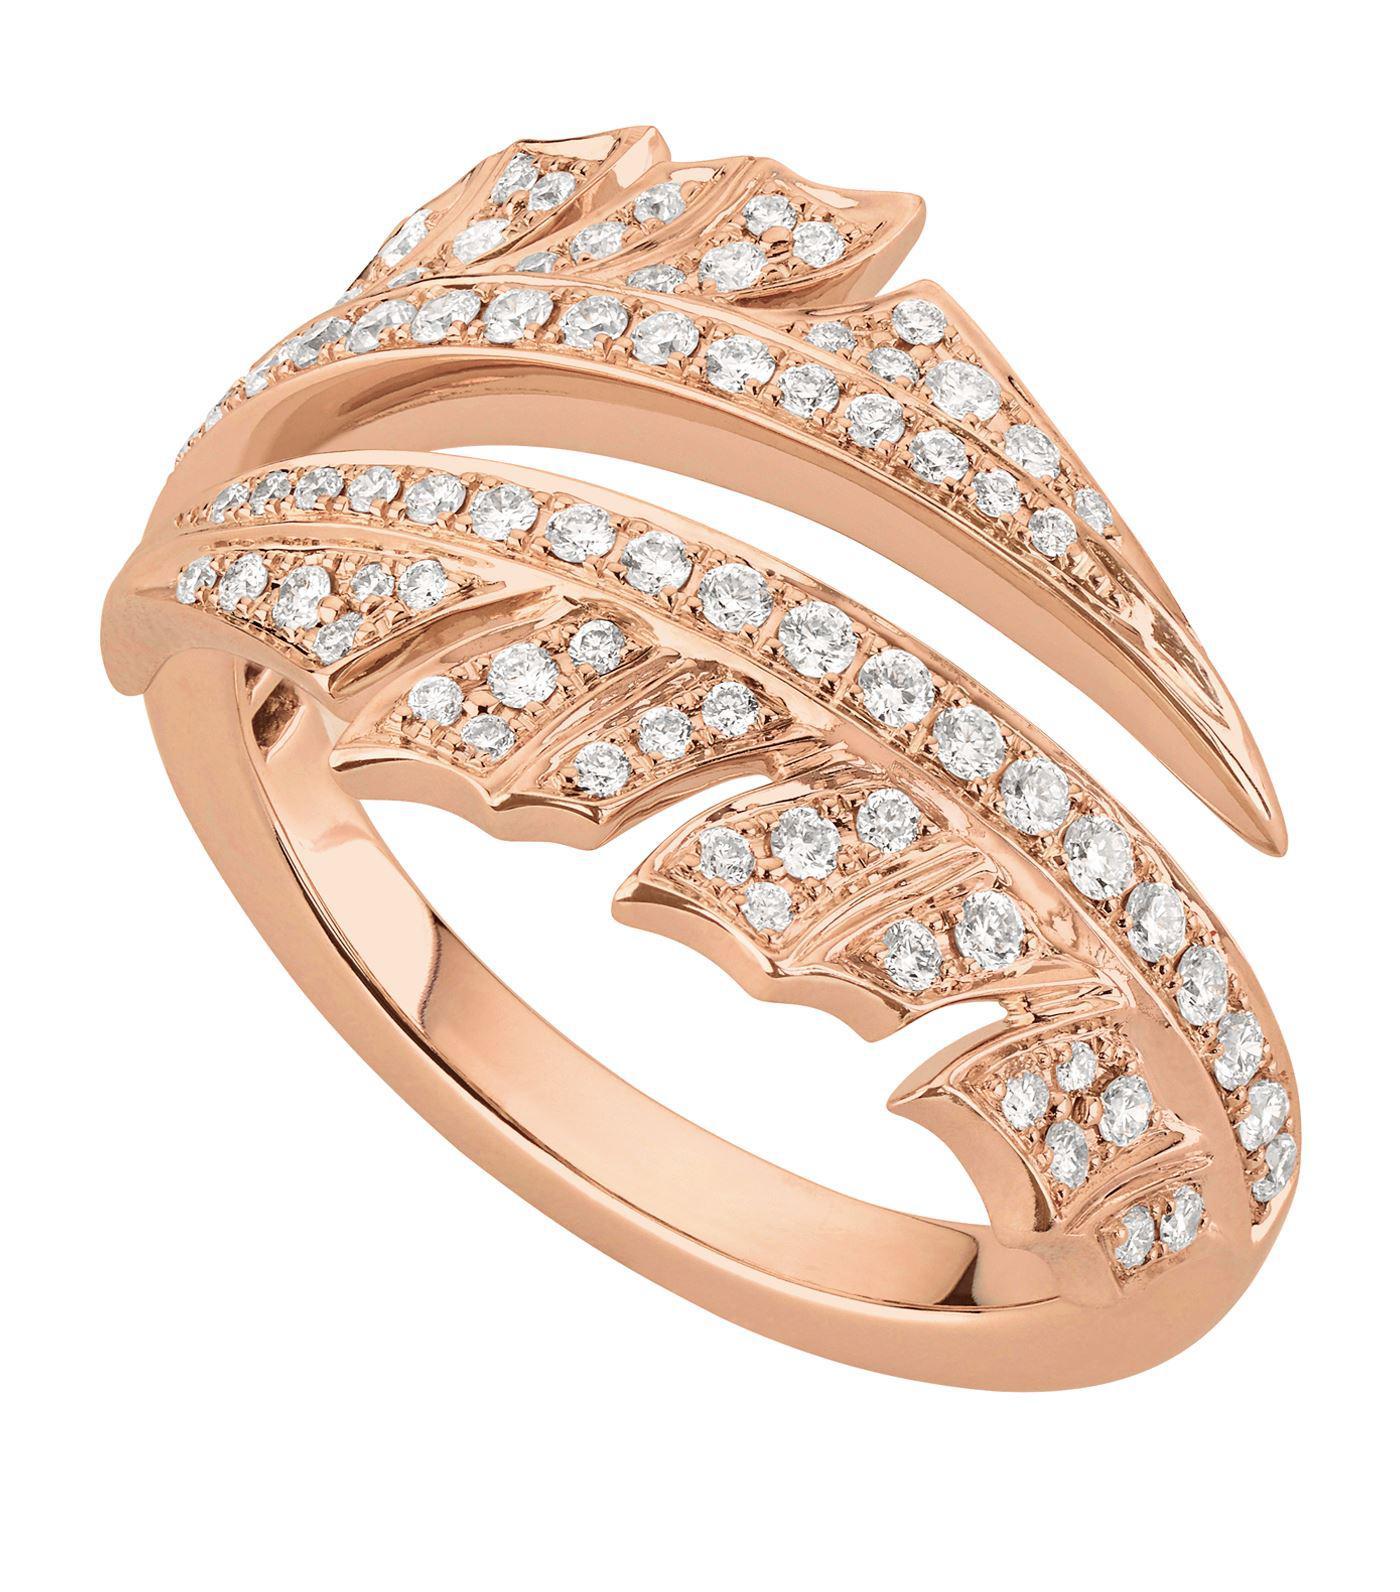 Magnipheasant 18-karat White Gold Diamond Ring - 6 Stephen Webster iTy9MufkzW